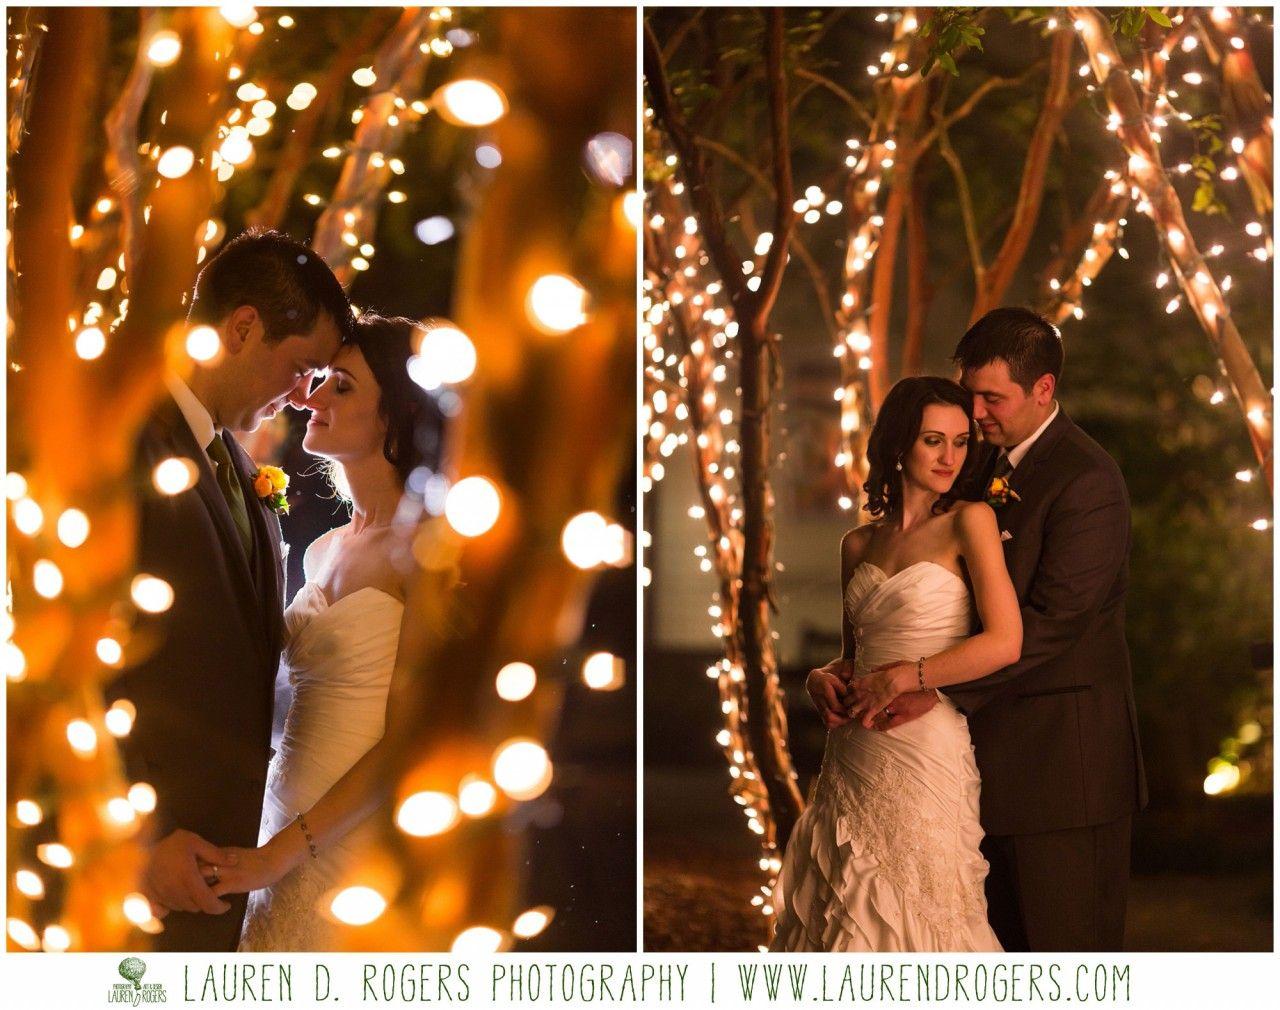 Night Portraits Wedding Photos At Night Night Wedding Wedding Christmas Lights Romantic E Night Wedding Photography Night Wedding Photos Night Time Wedding